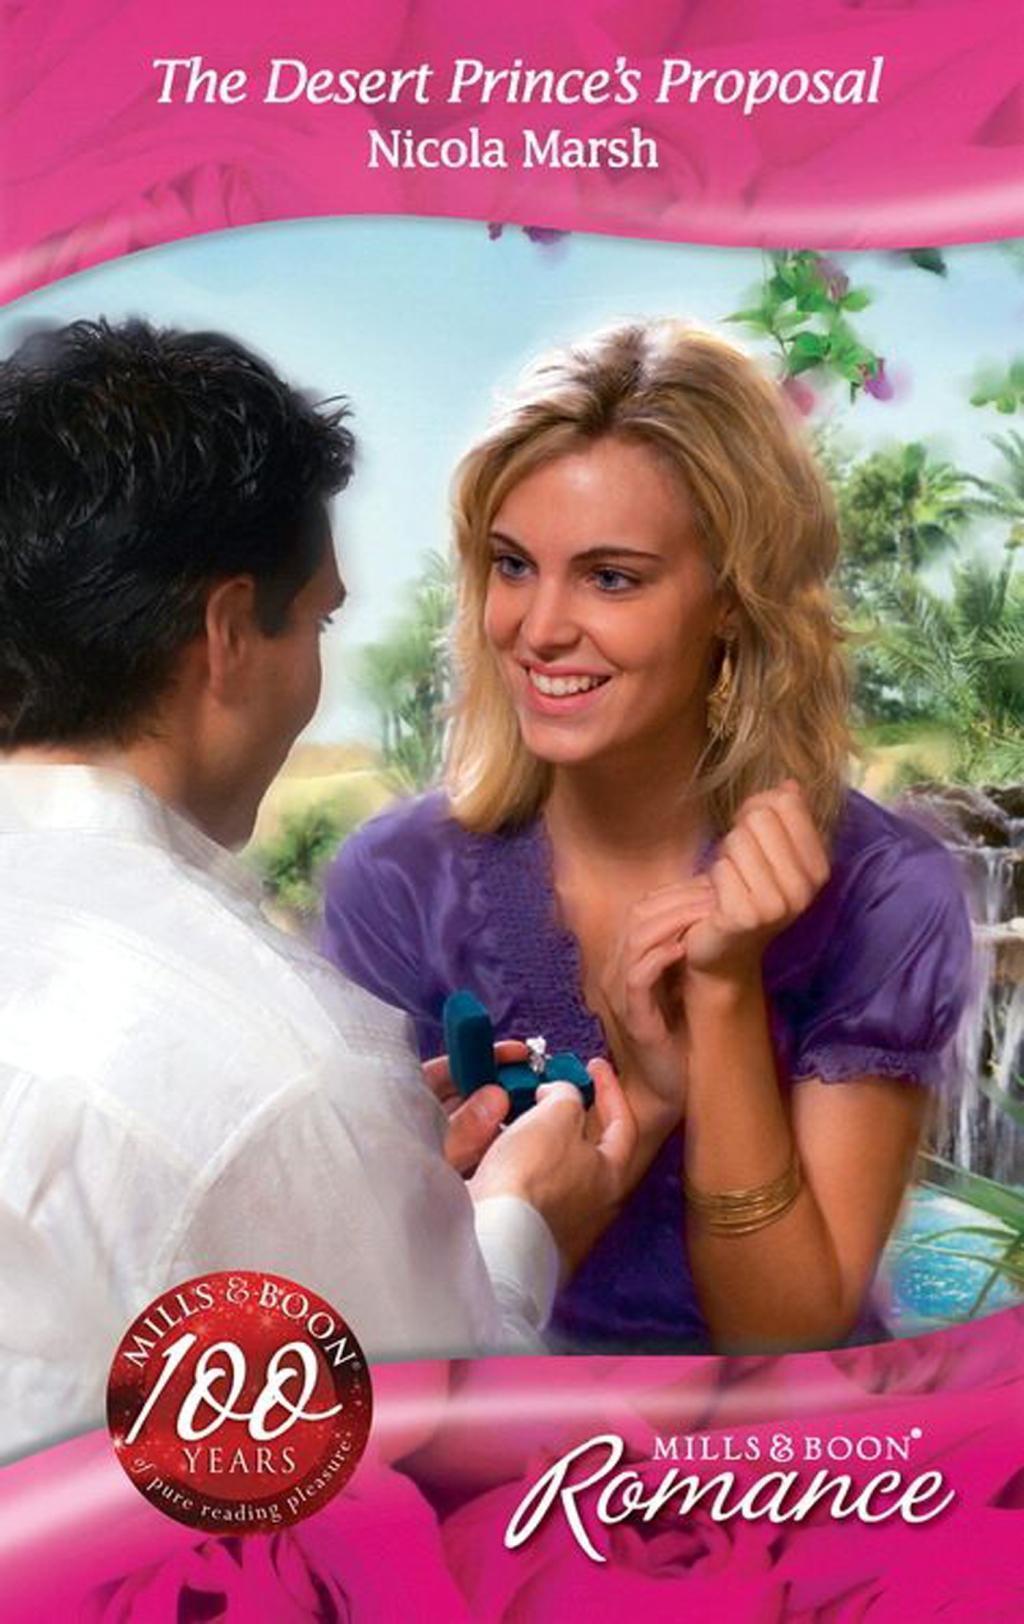 The Desert Prince's Proposal (Mills & Boon Romance) (Desert Brides, Book 18)